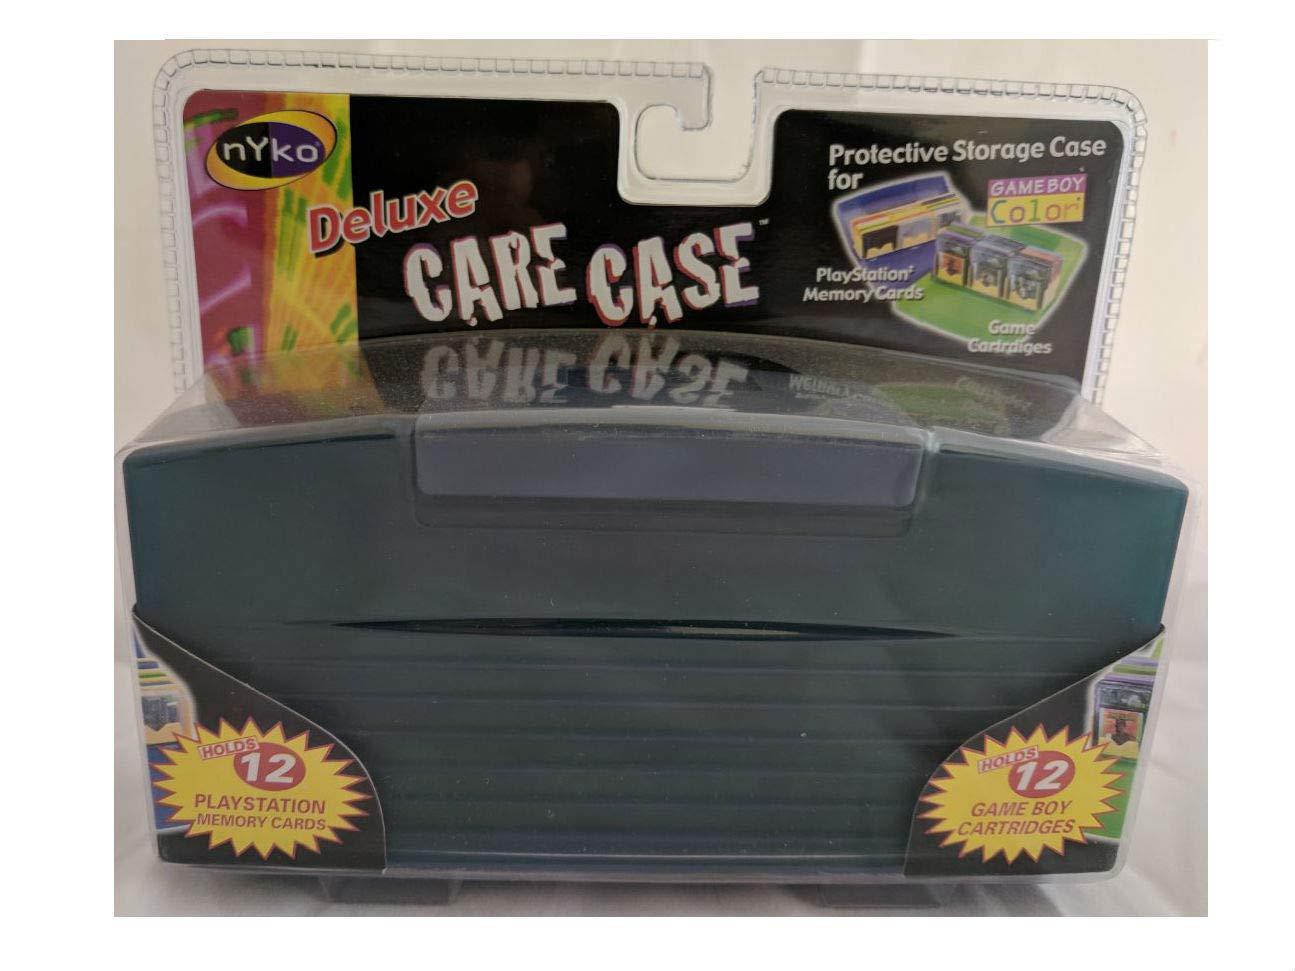 Nyko Deluxe Original Gameboy (Original, Pocket, Color) Game Cartridge Care Case (12 Games) - Dark Blue/Black